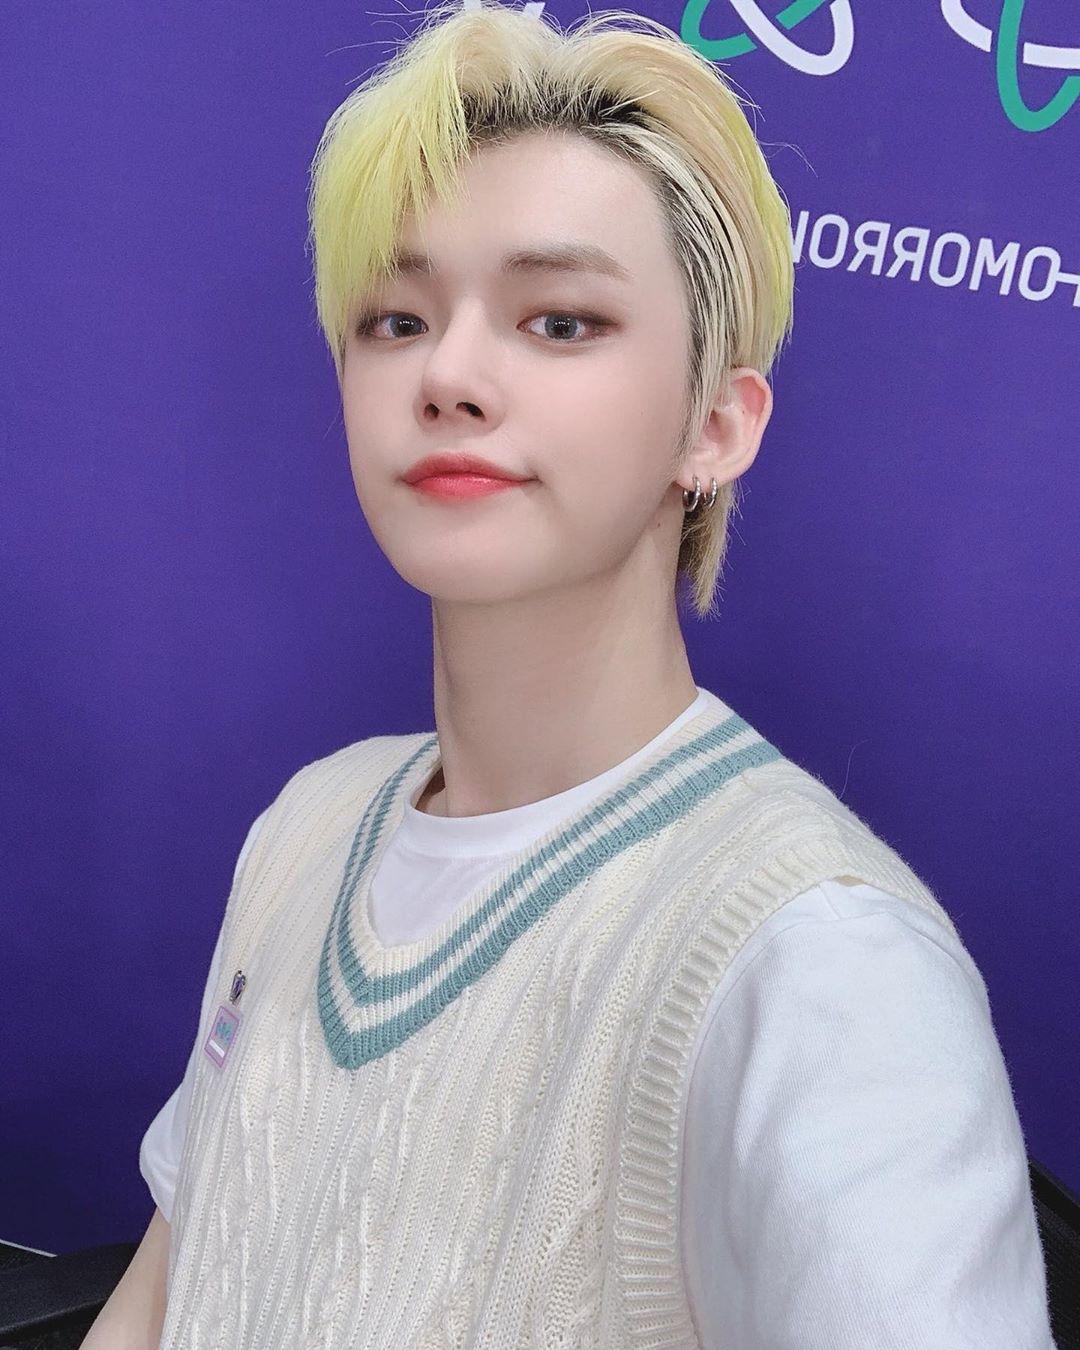 Yeonjun South Korean Singer, Rapper